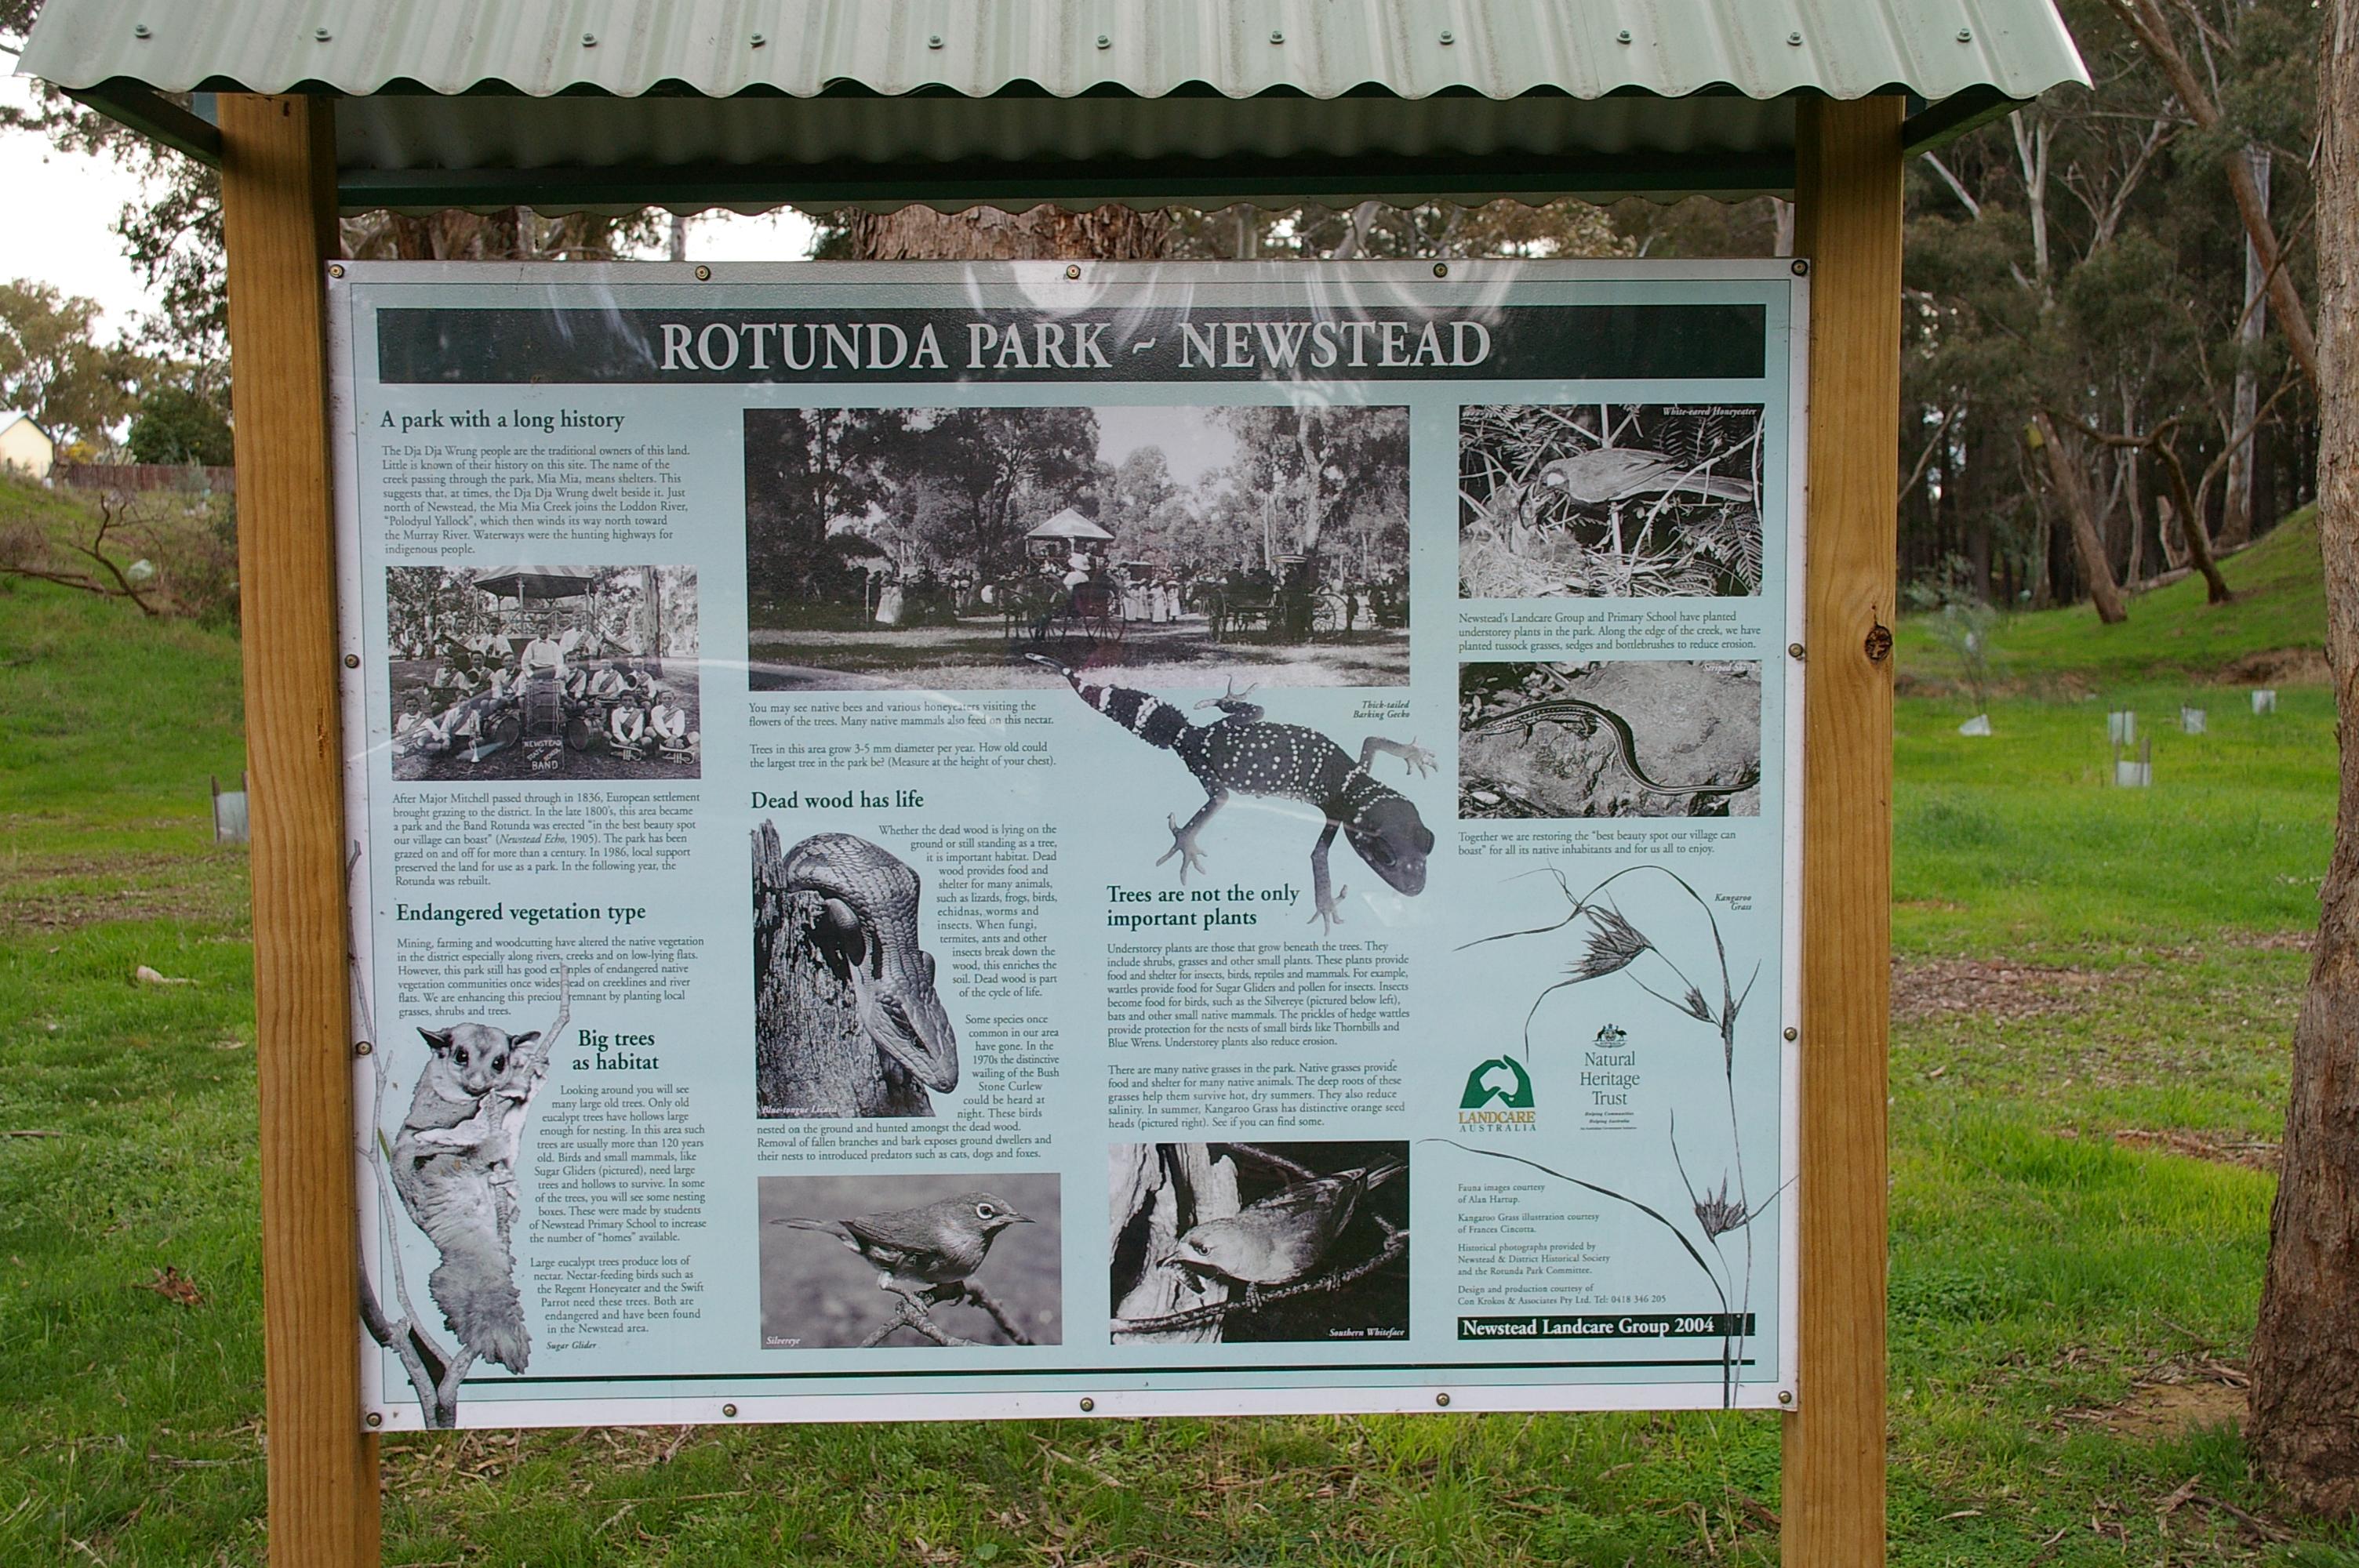 Interpretive signage at Rotunda Park Newstead